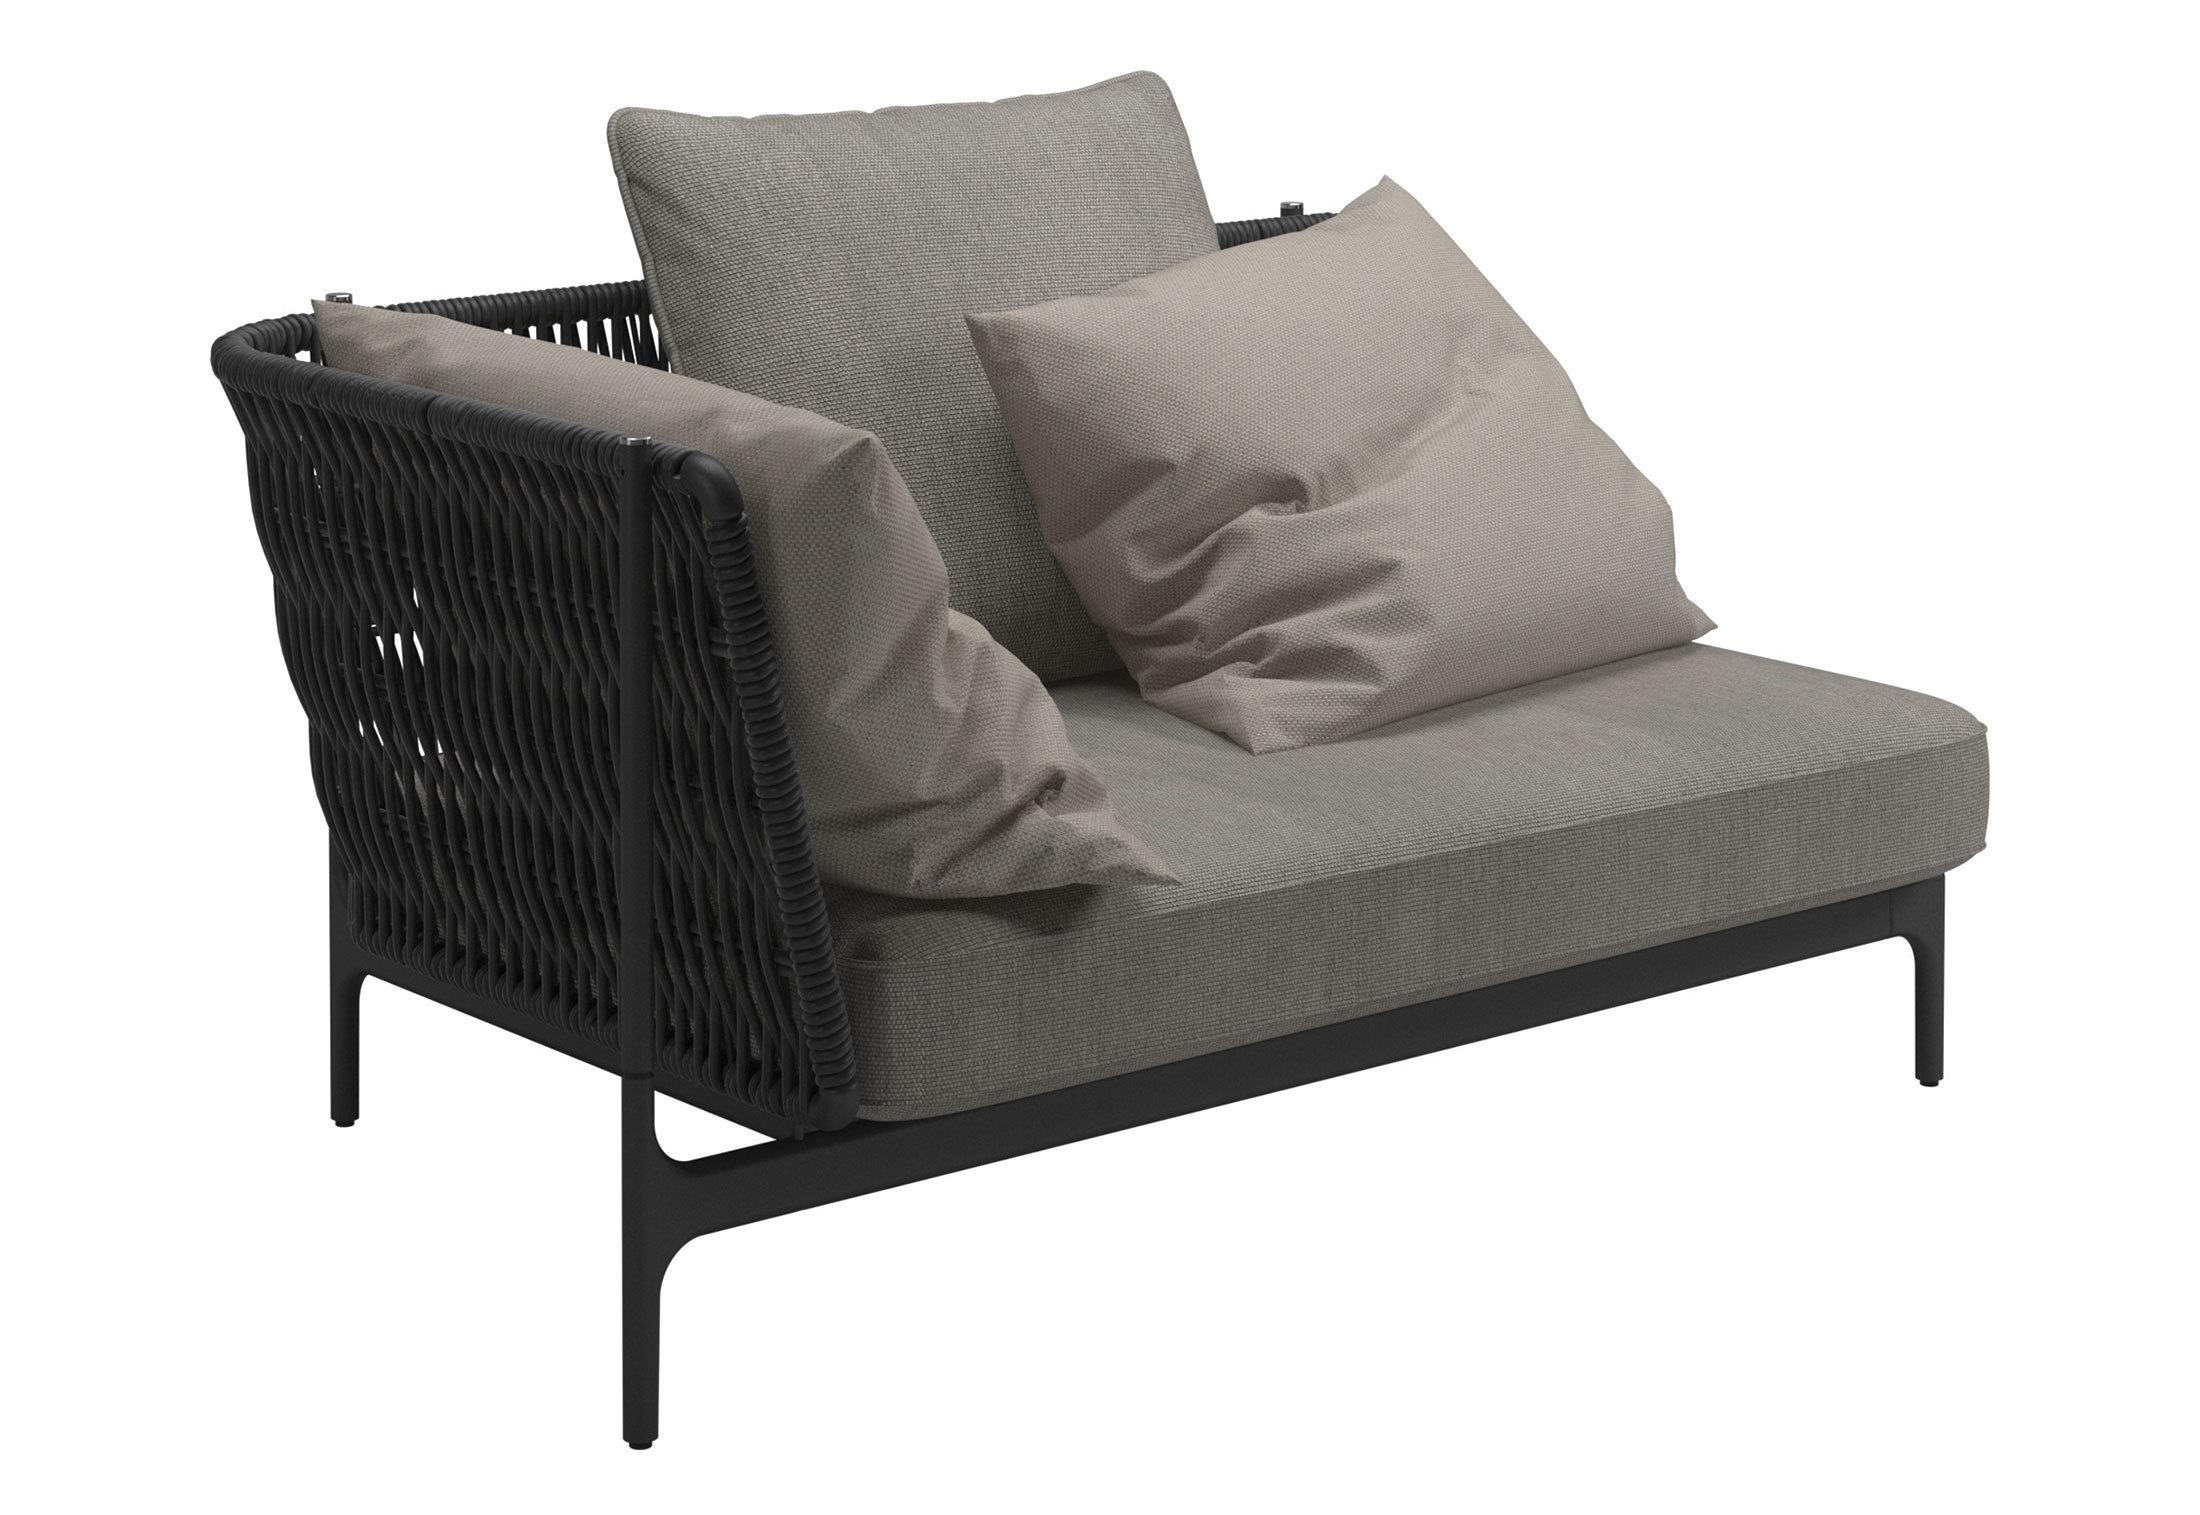 Grand Weave Left Corner Unitgloster Furniture   Stylepark Within Sofa Corner Units (Image 12 of 24)